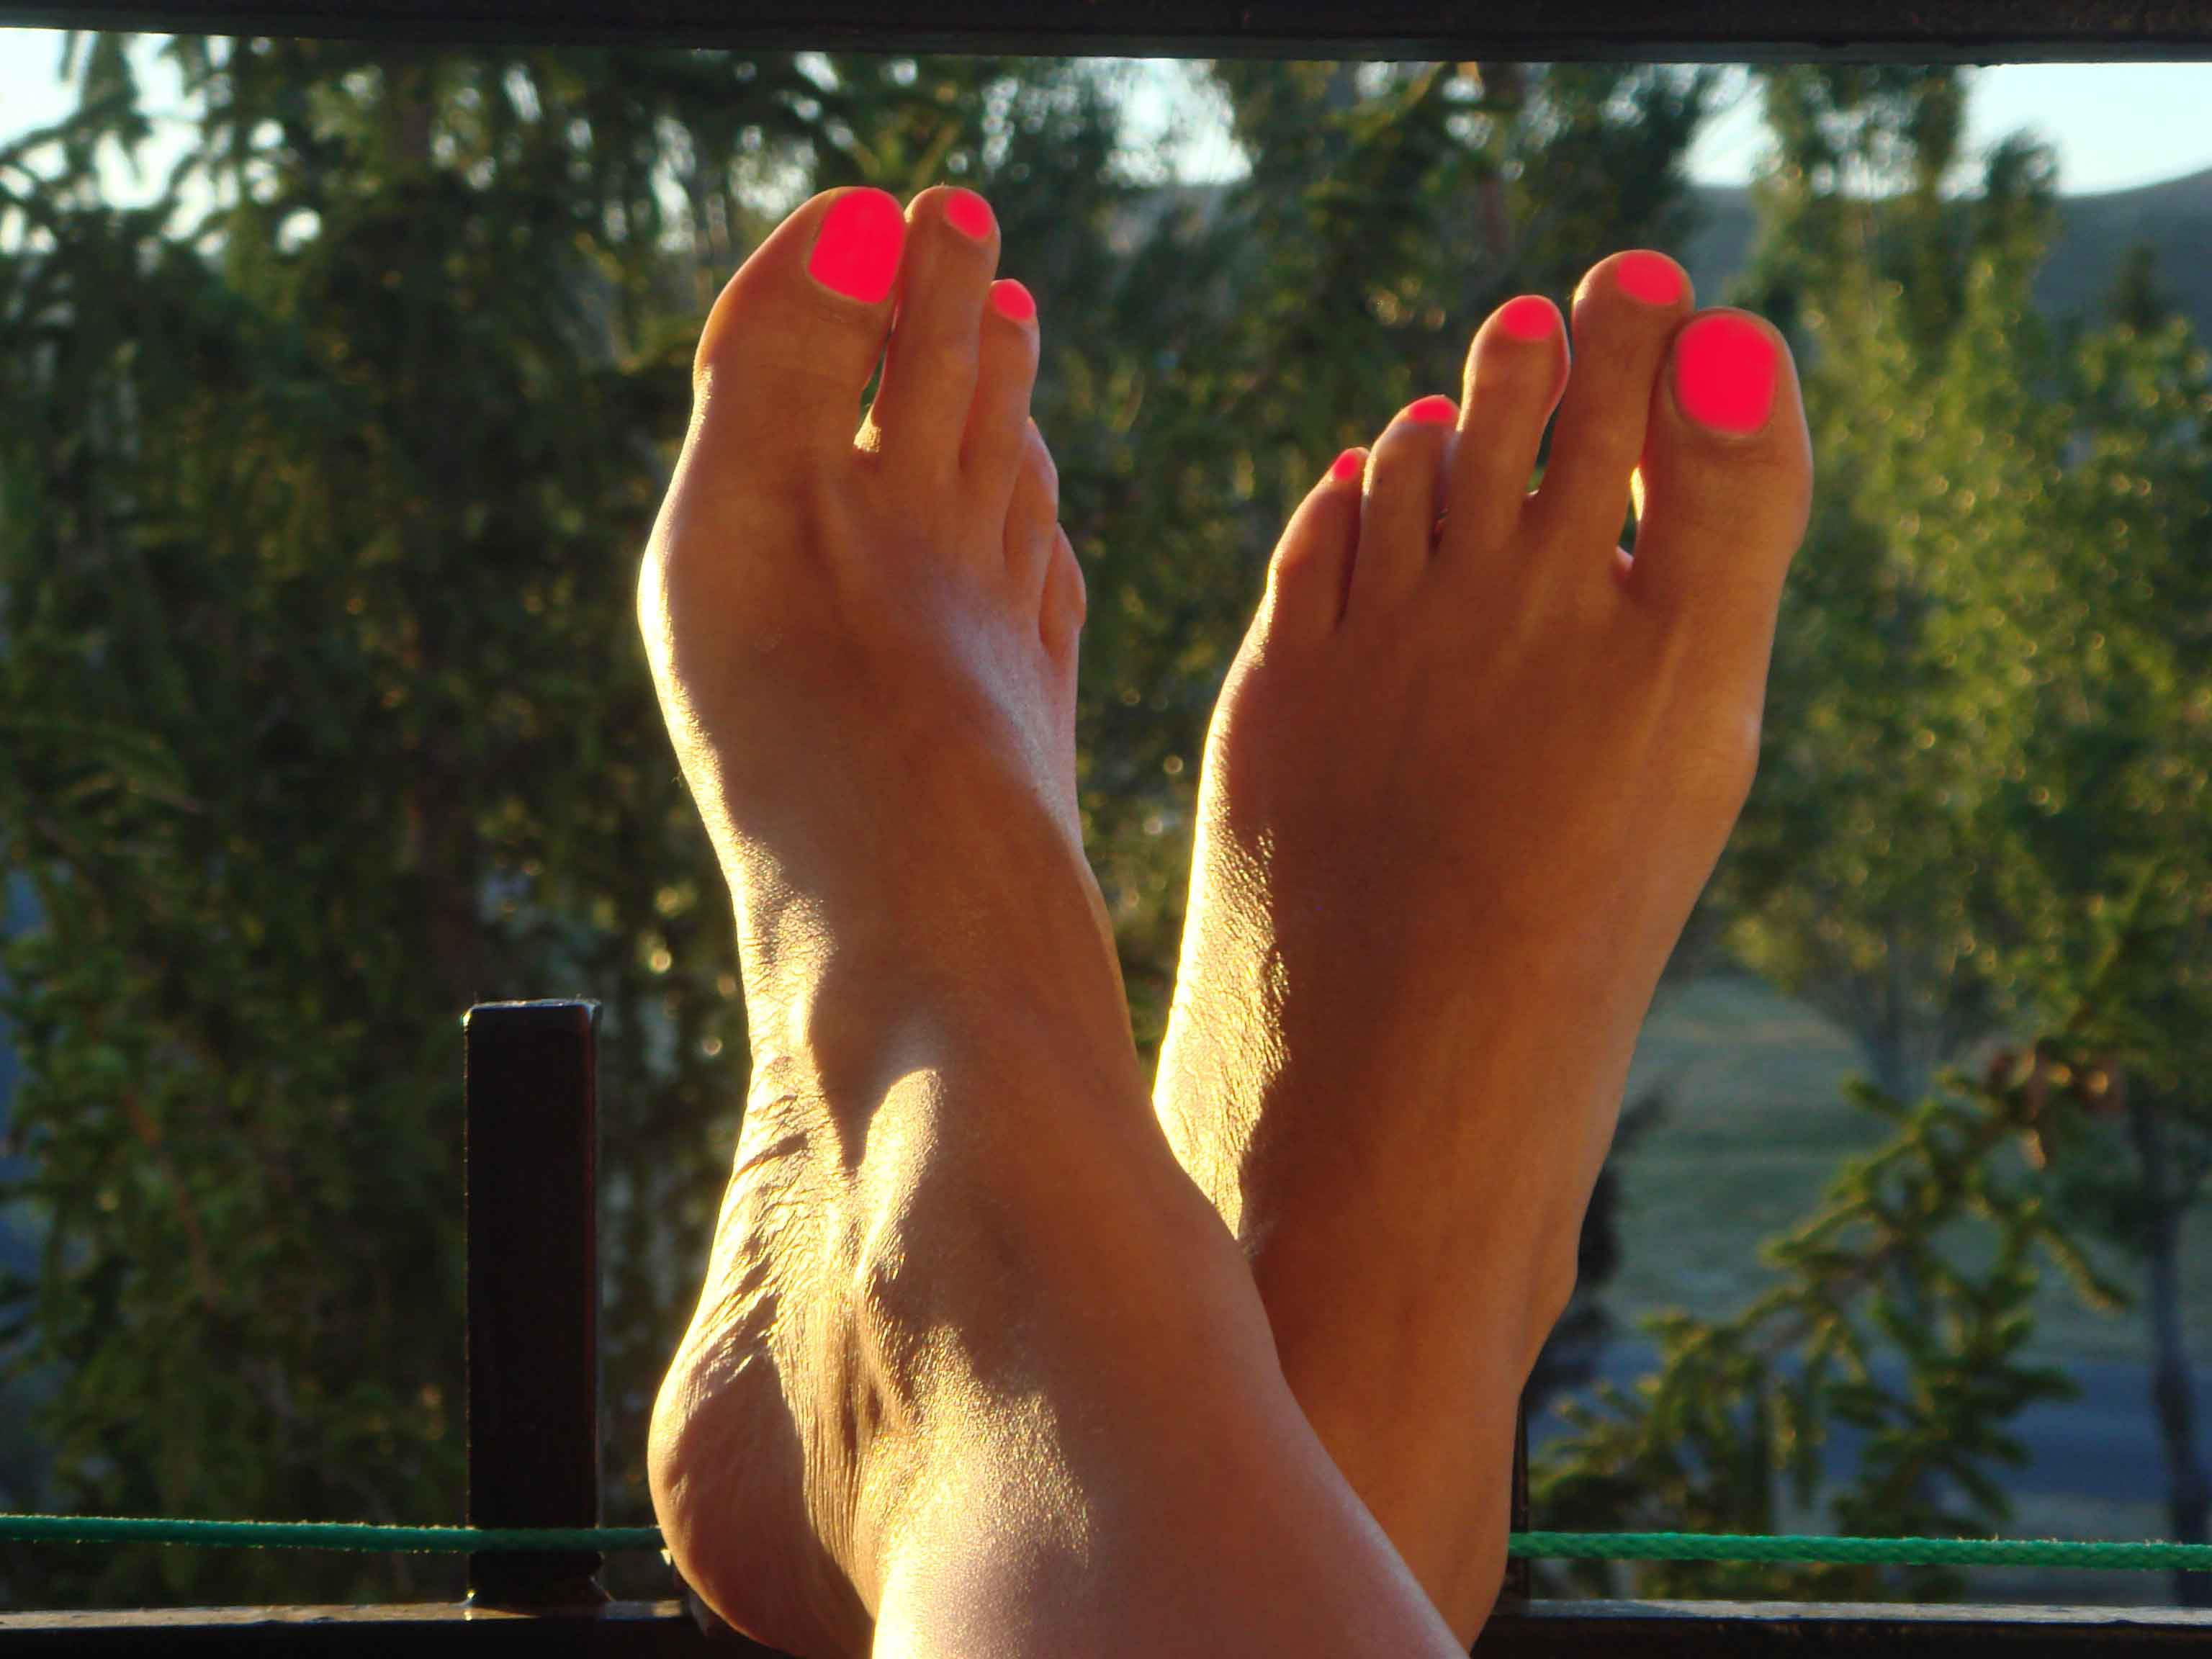 Bonitos Zapatos Pies Mujer De Fotos En Dsoy1ynt QrstdhC